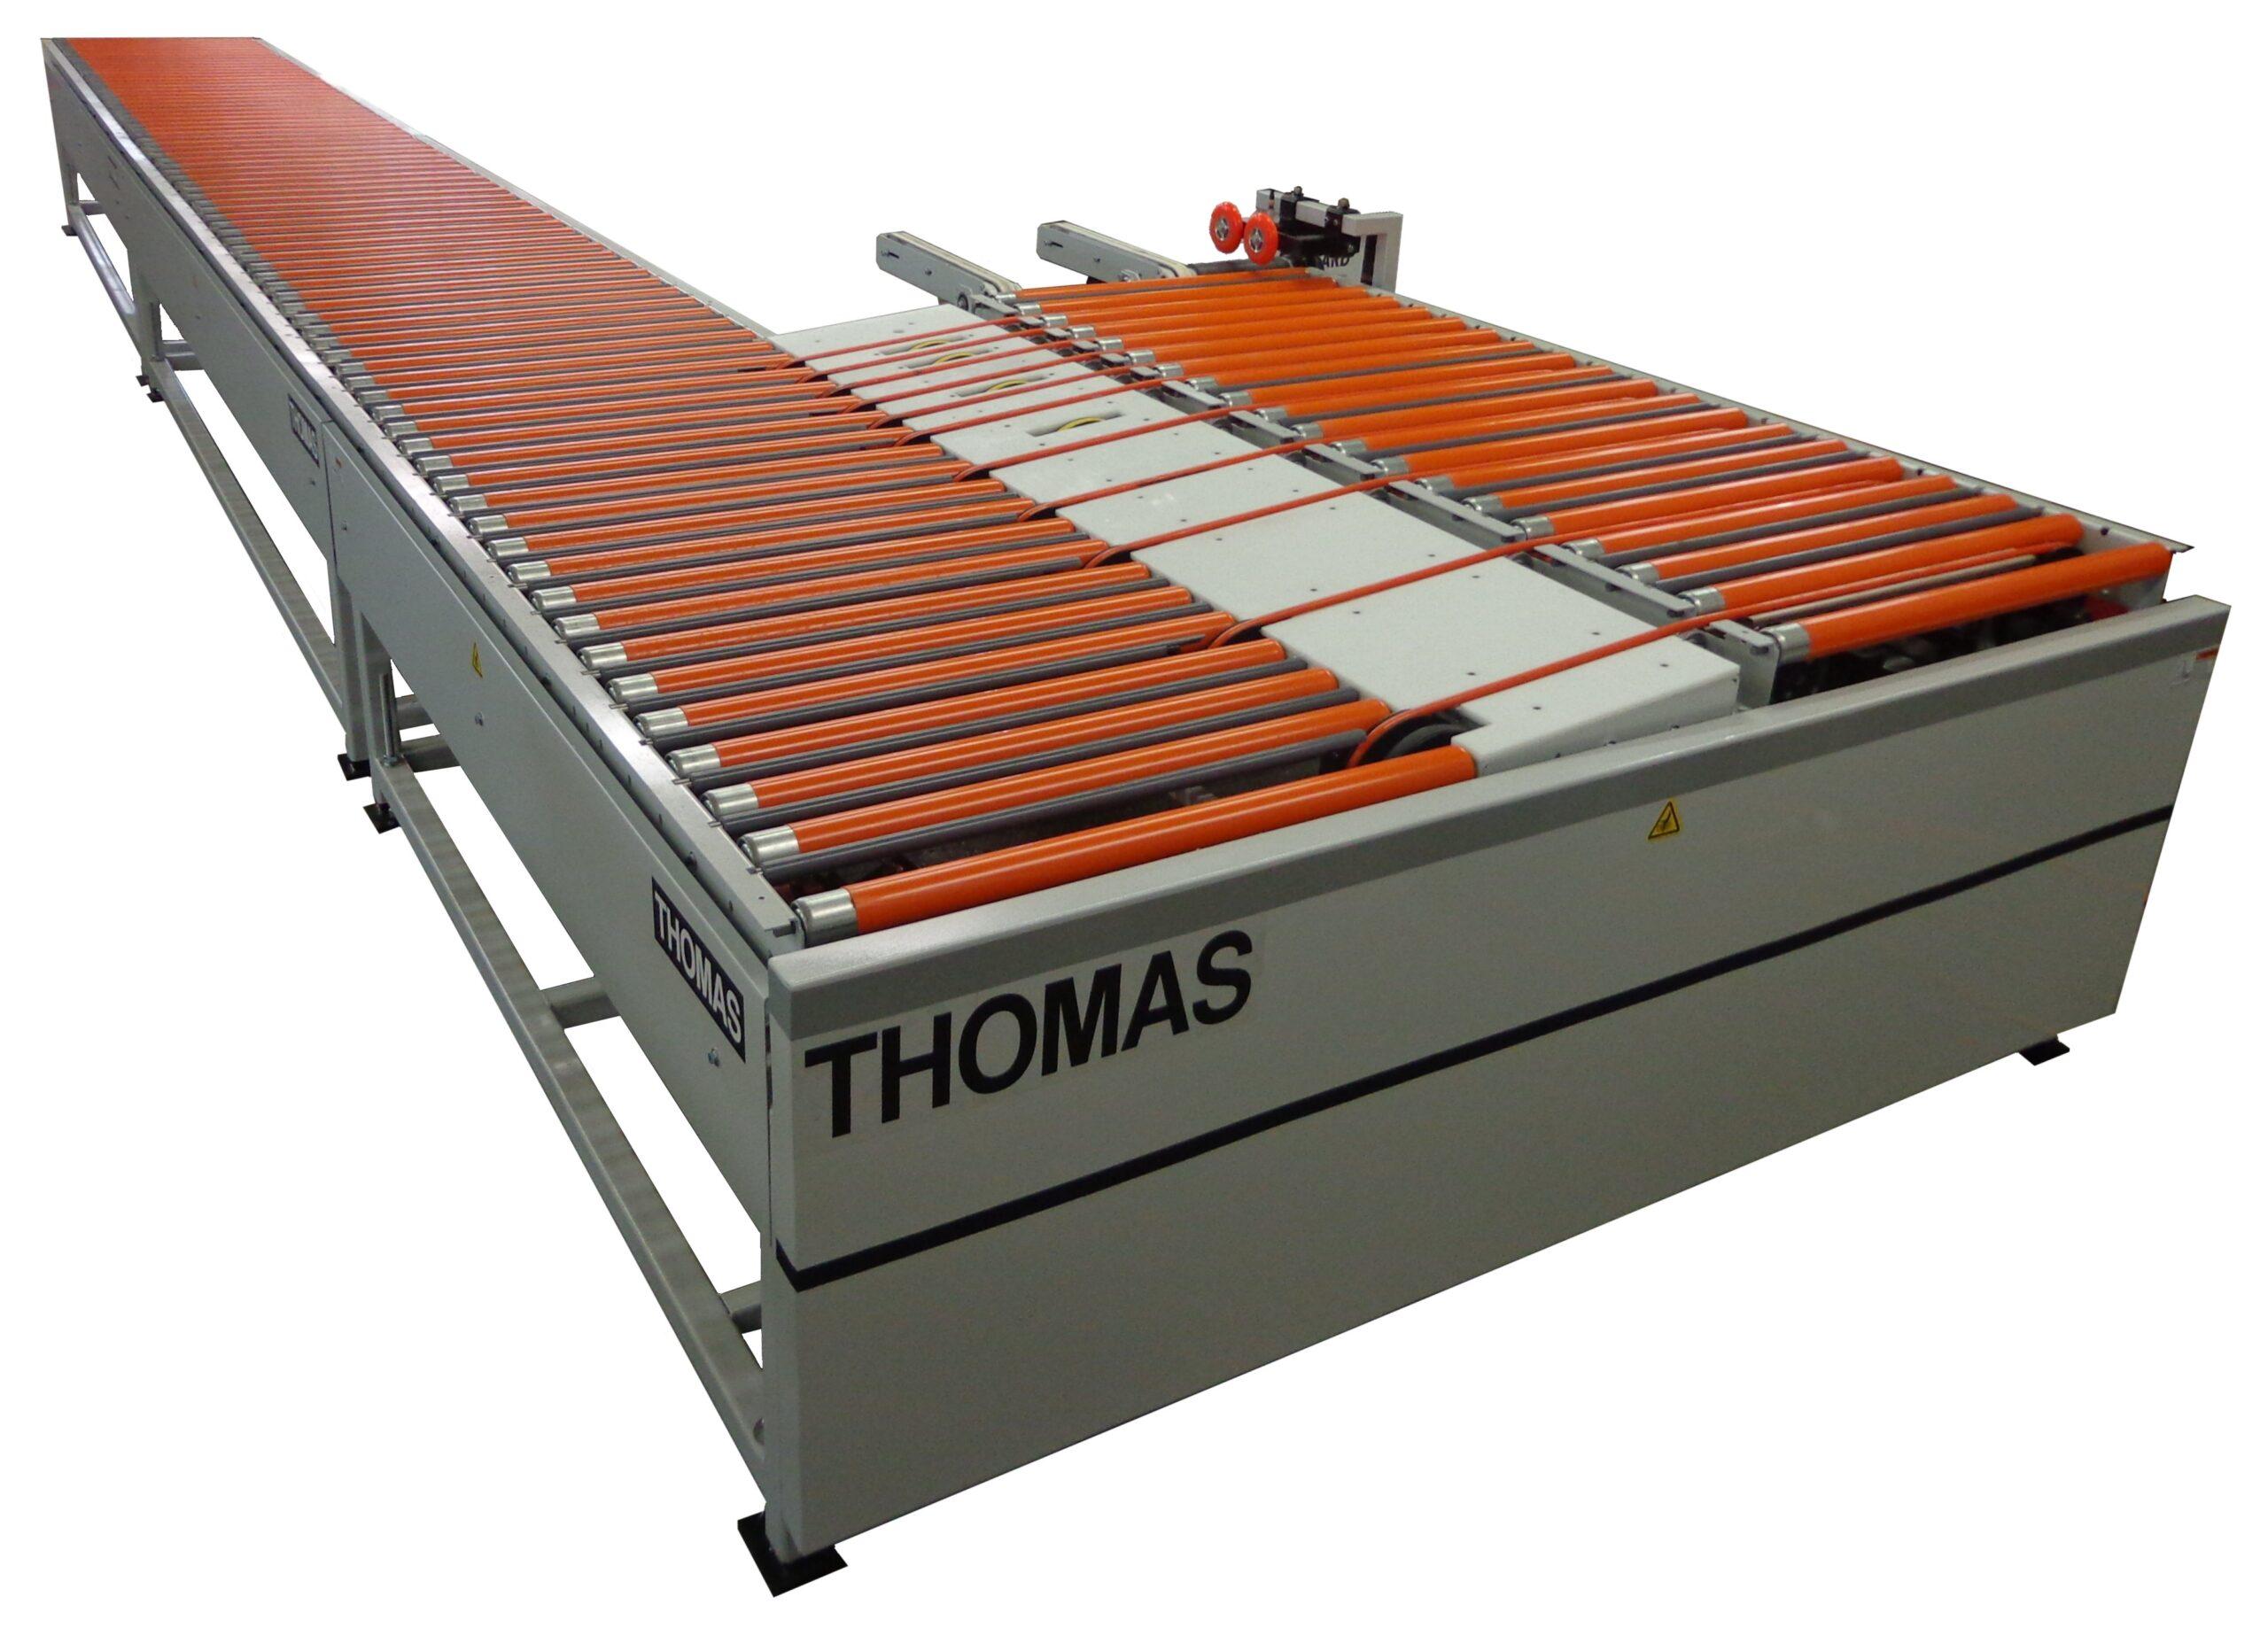 Standard-Size-Turnbak-Conveyor-with-Optional-Auto-Turner